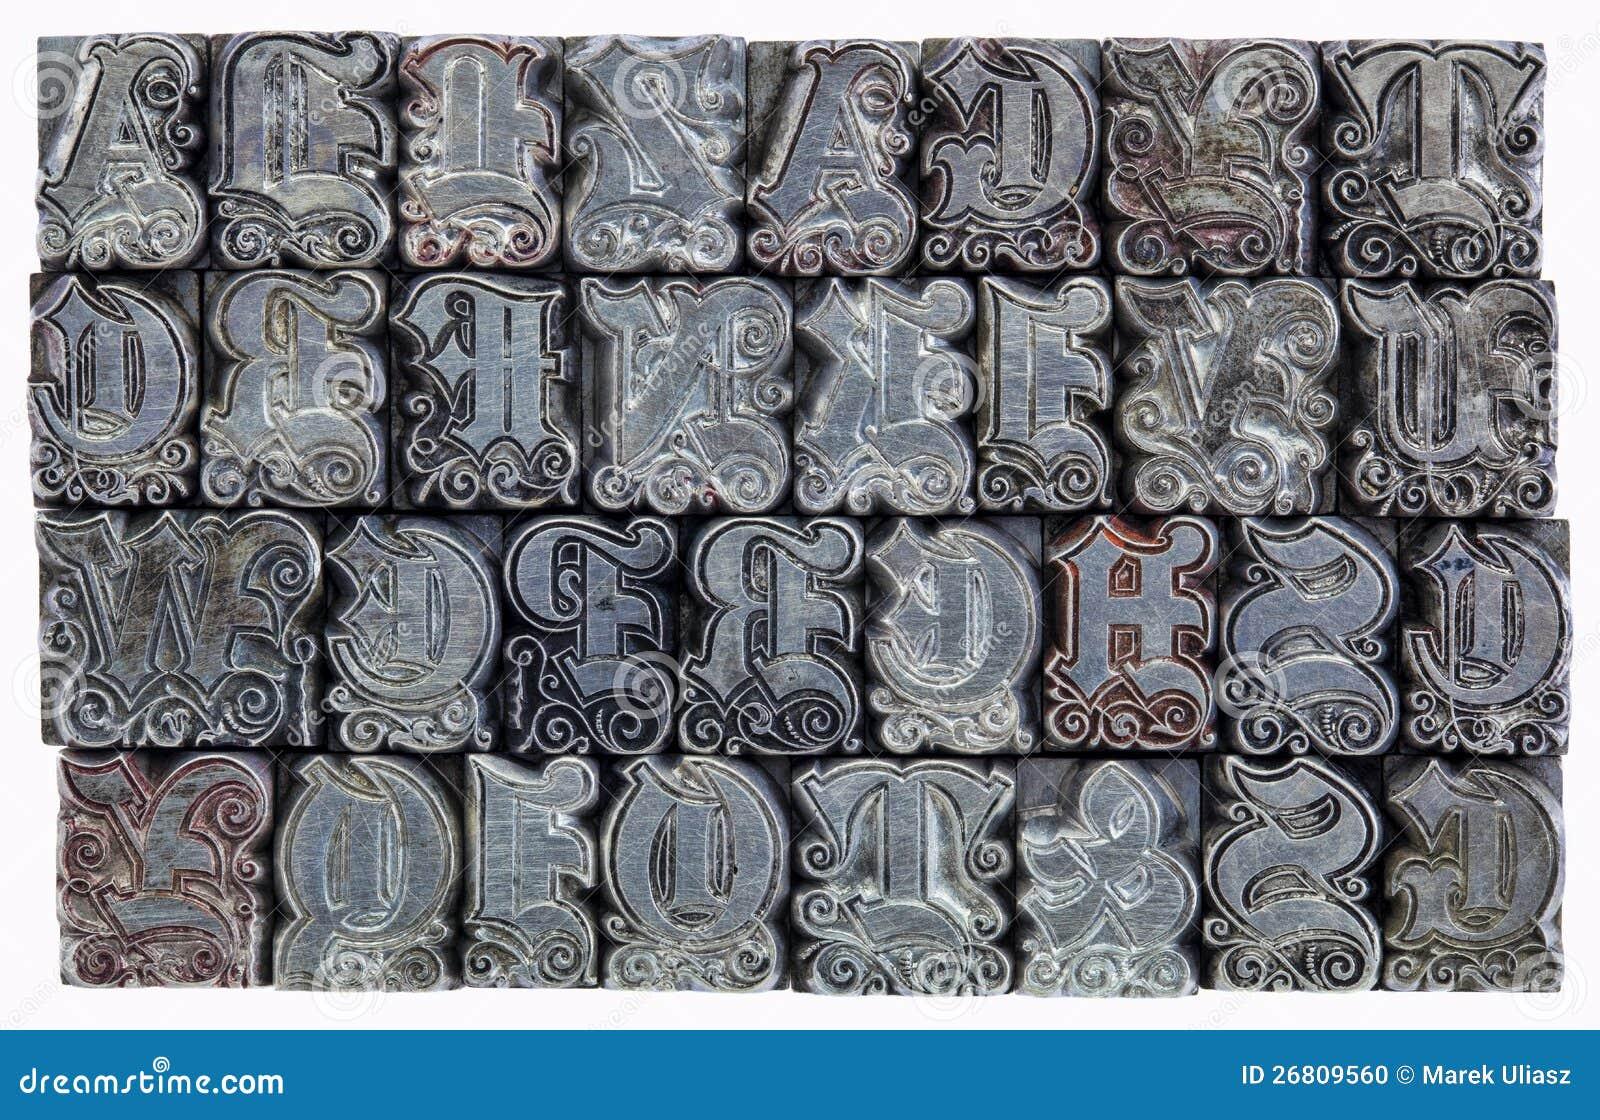 Decorative metal letterpress type stock photo image 26809560 - Type decoratie ...